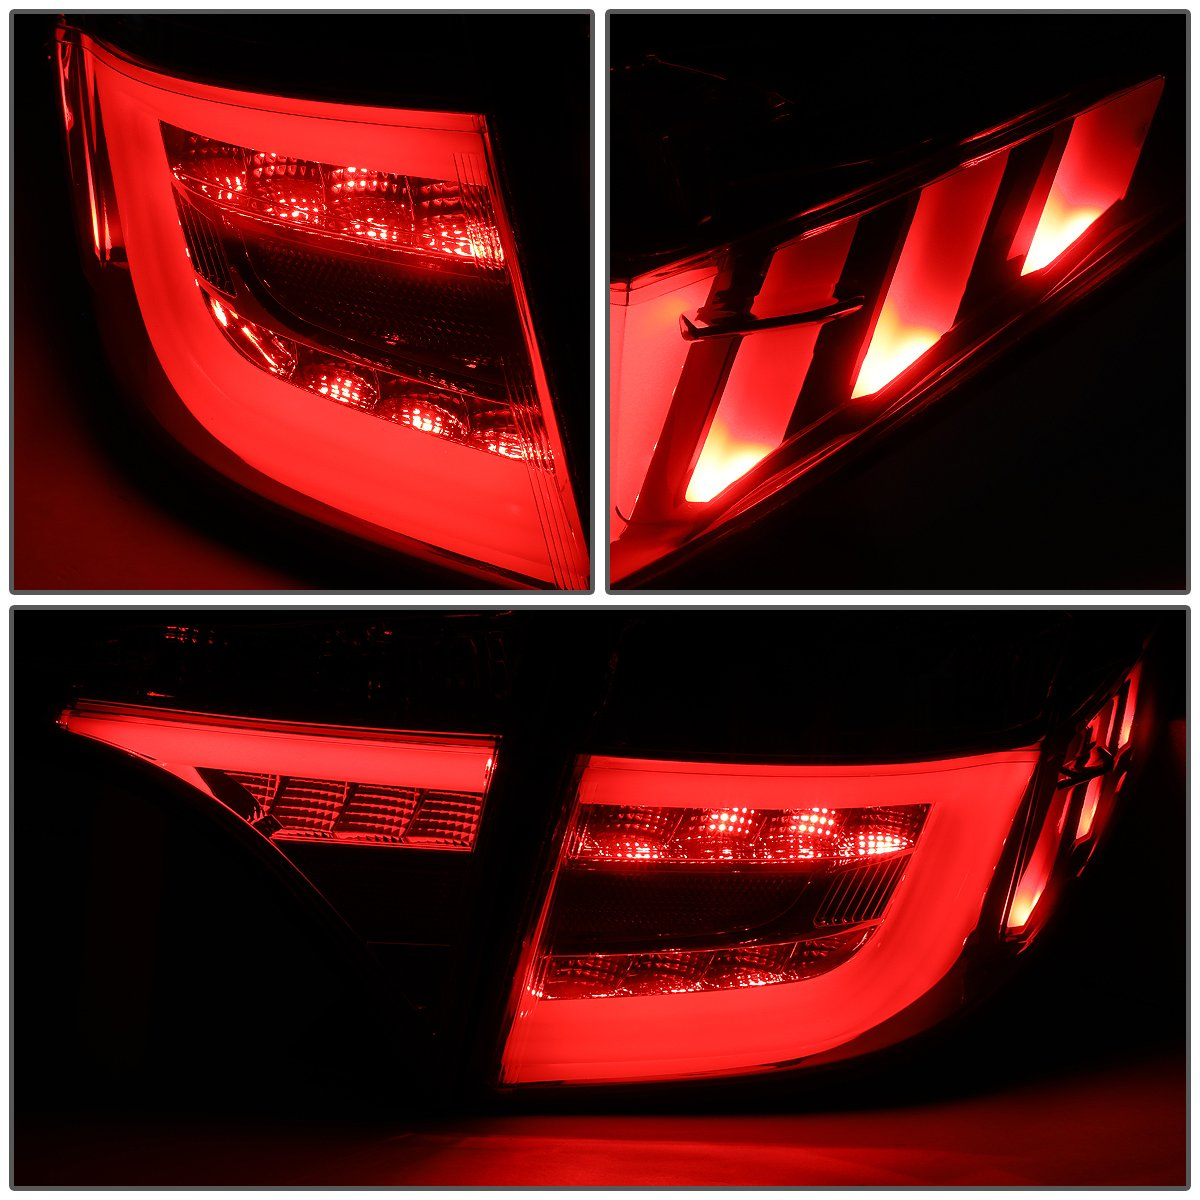 for 14-18 Corolla Sedan DNA Motoring TL-001-SM-CL1 Pair LED DRL Light Bar Tail Lamps